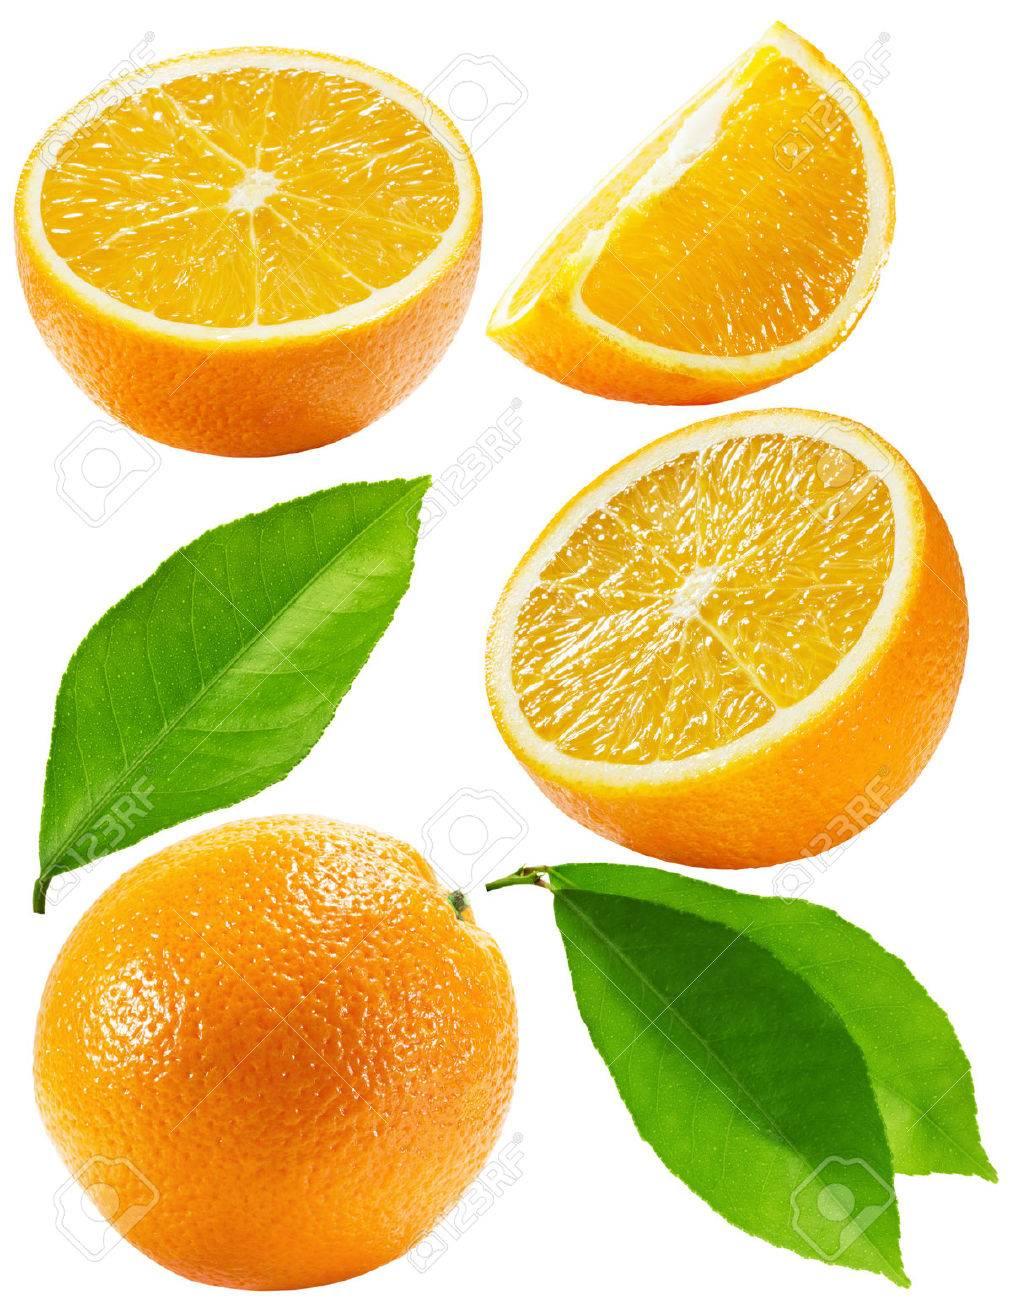 set of oranges isolated on the white background. - 38642024